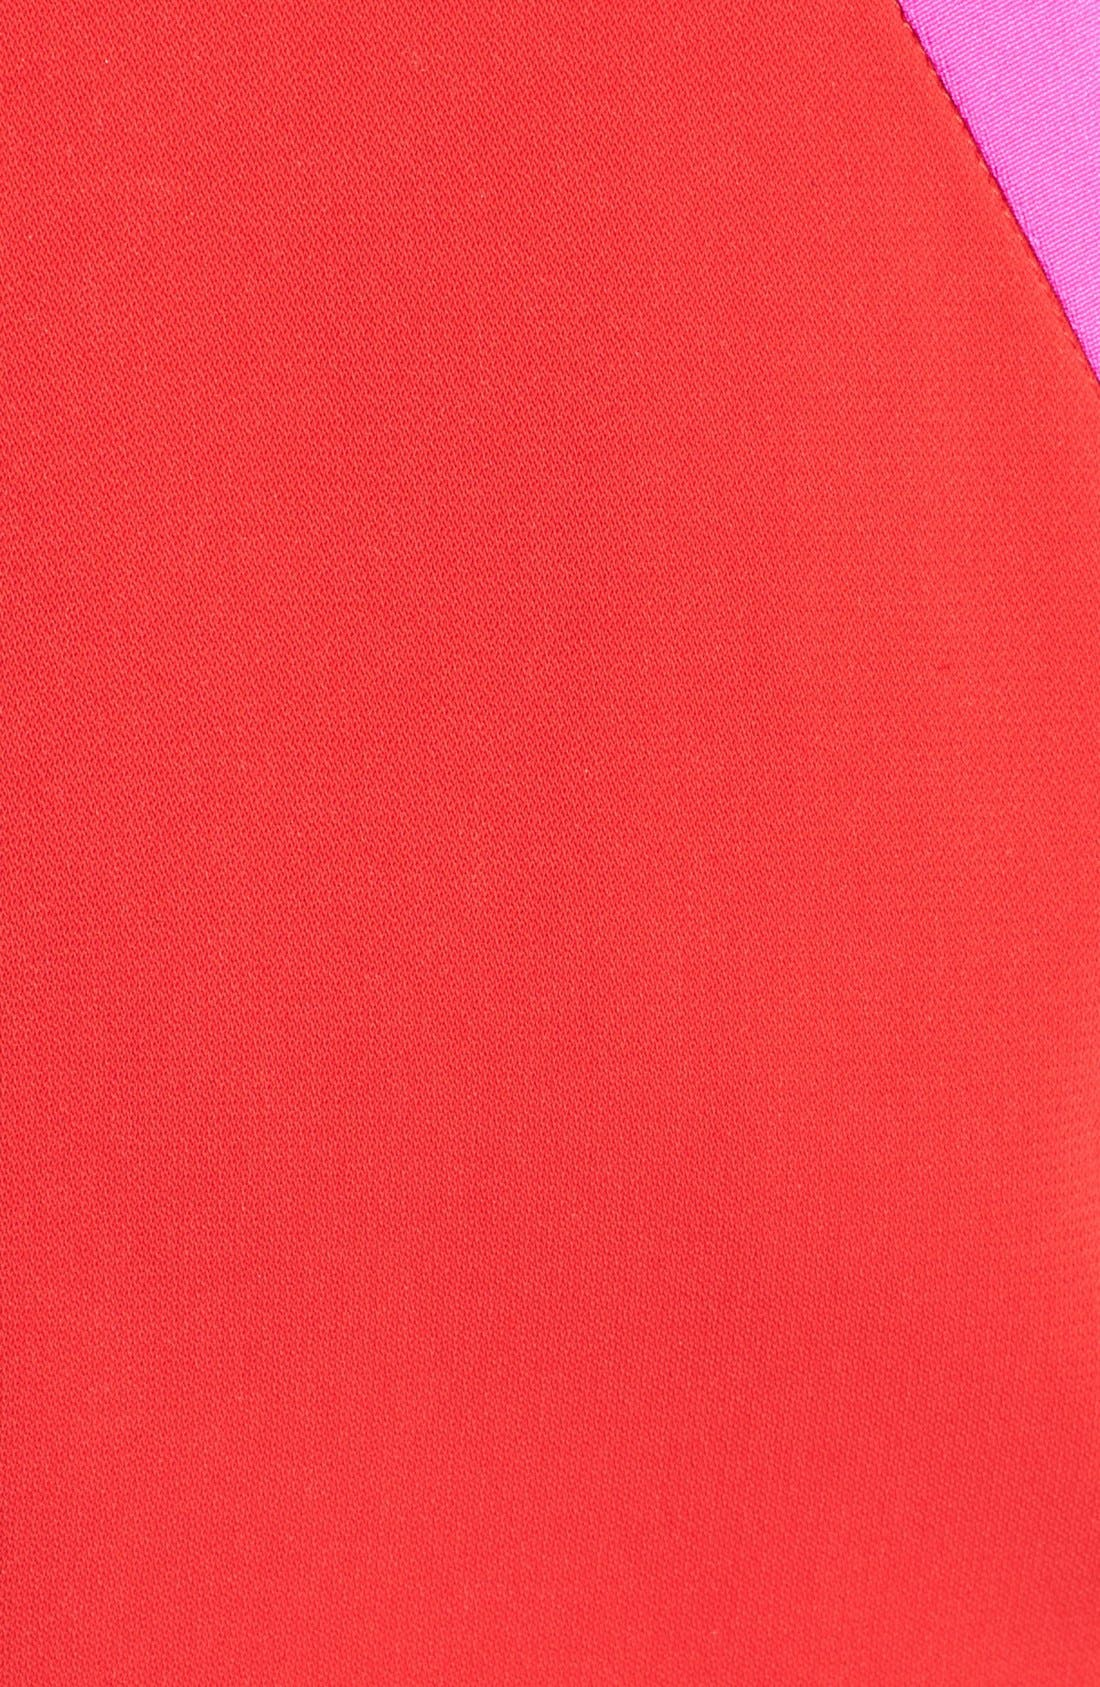 Alternate Image 3  - Jay Godfrey 'Woodward' Contrast Trim Sheath Dress